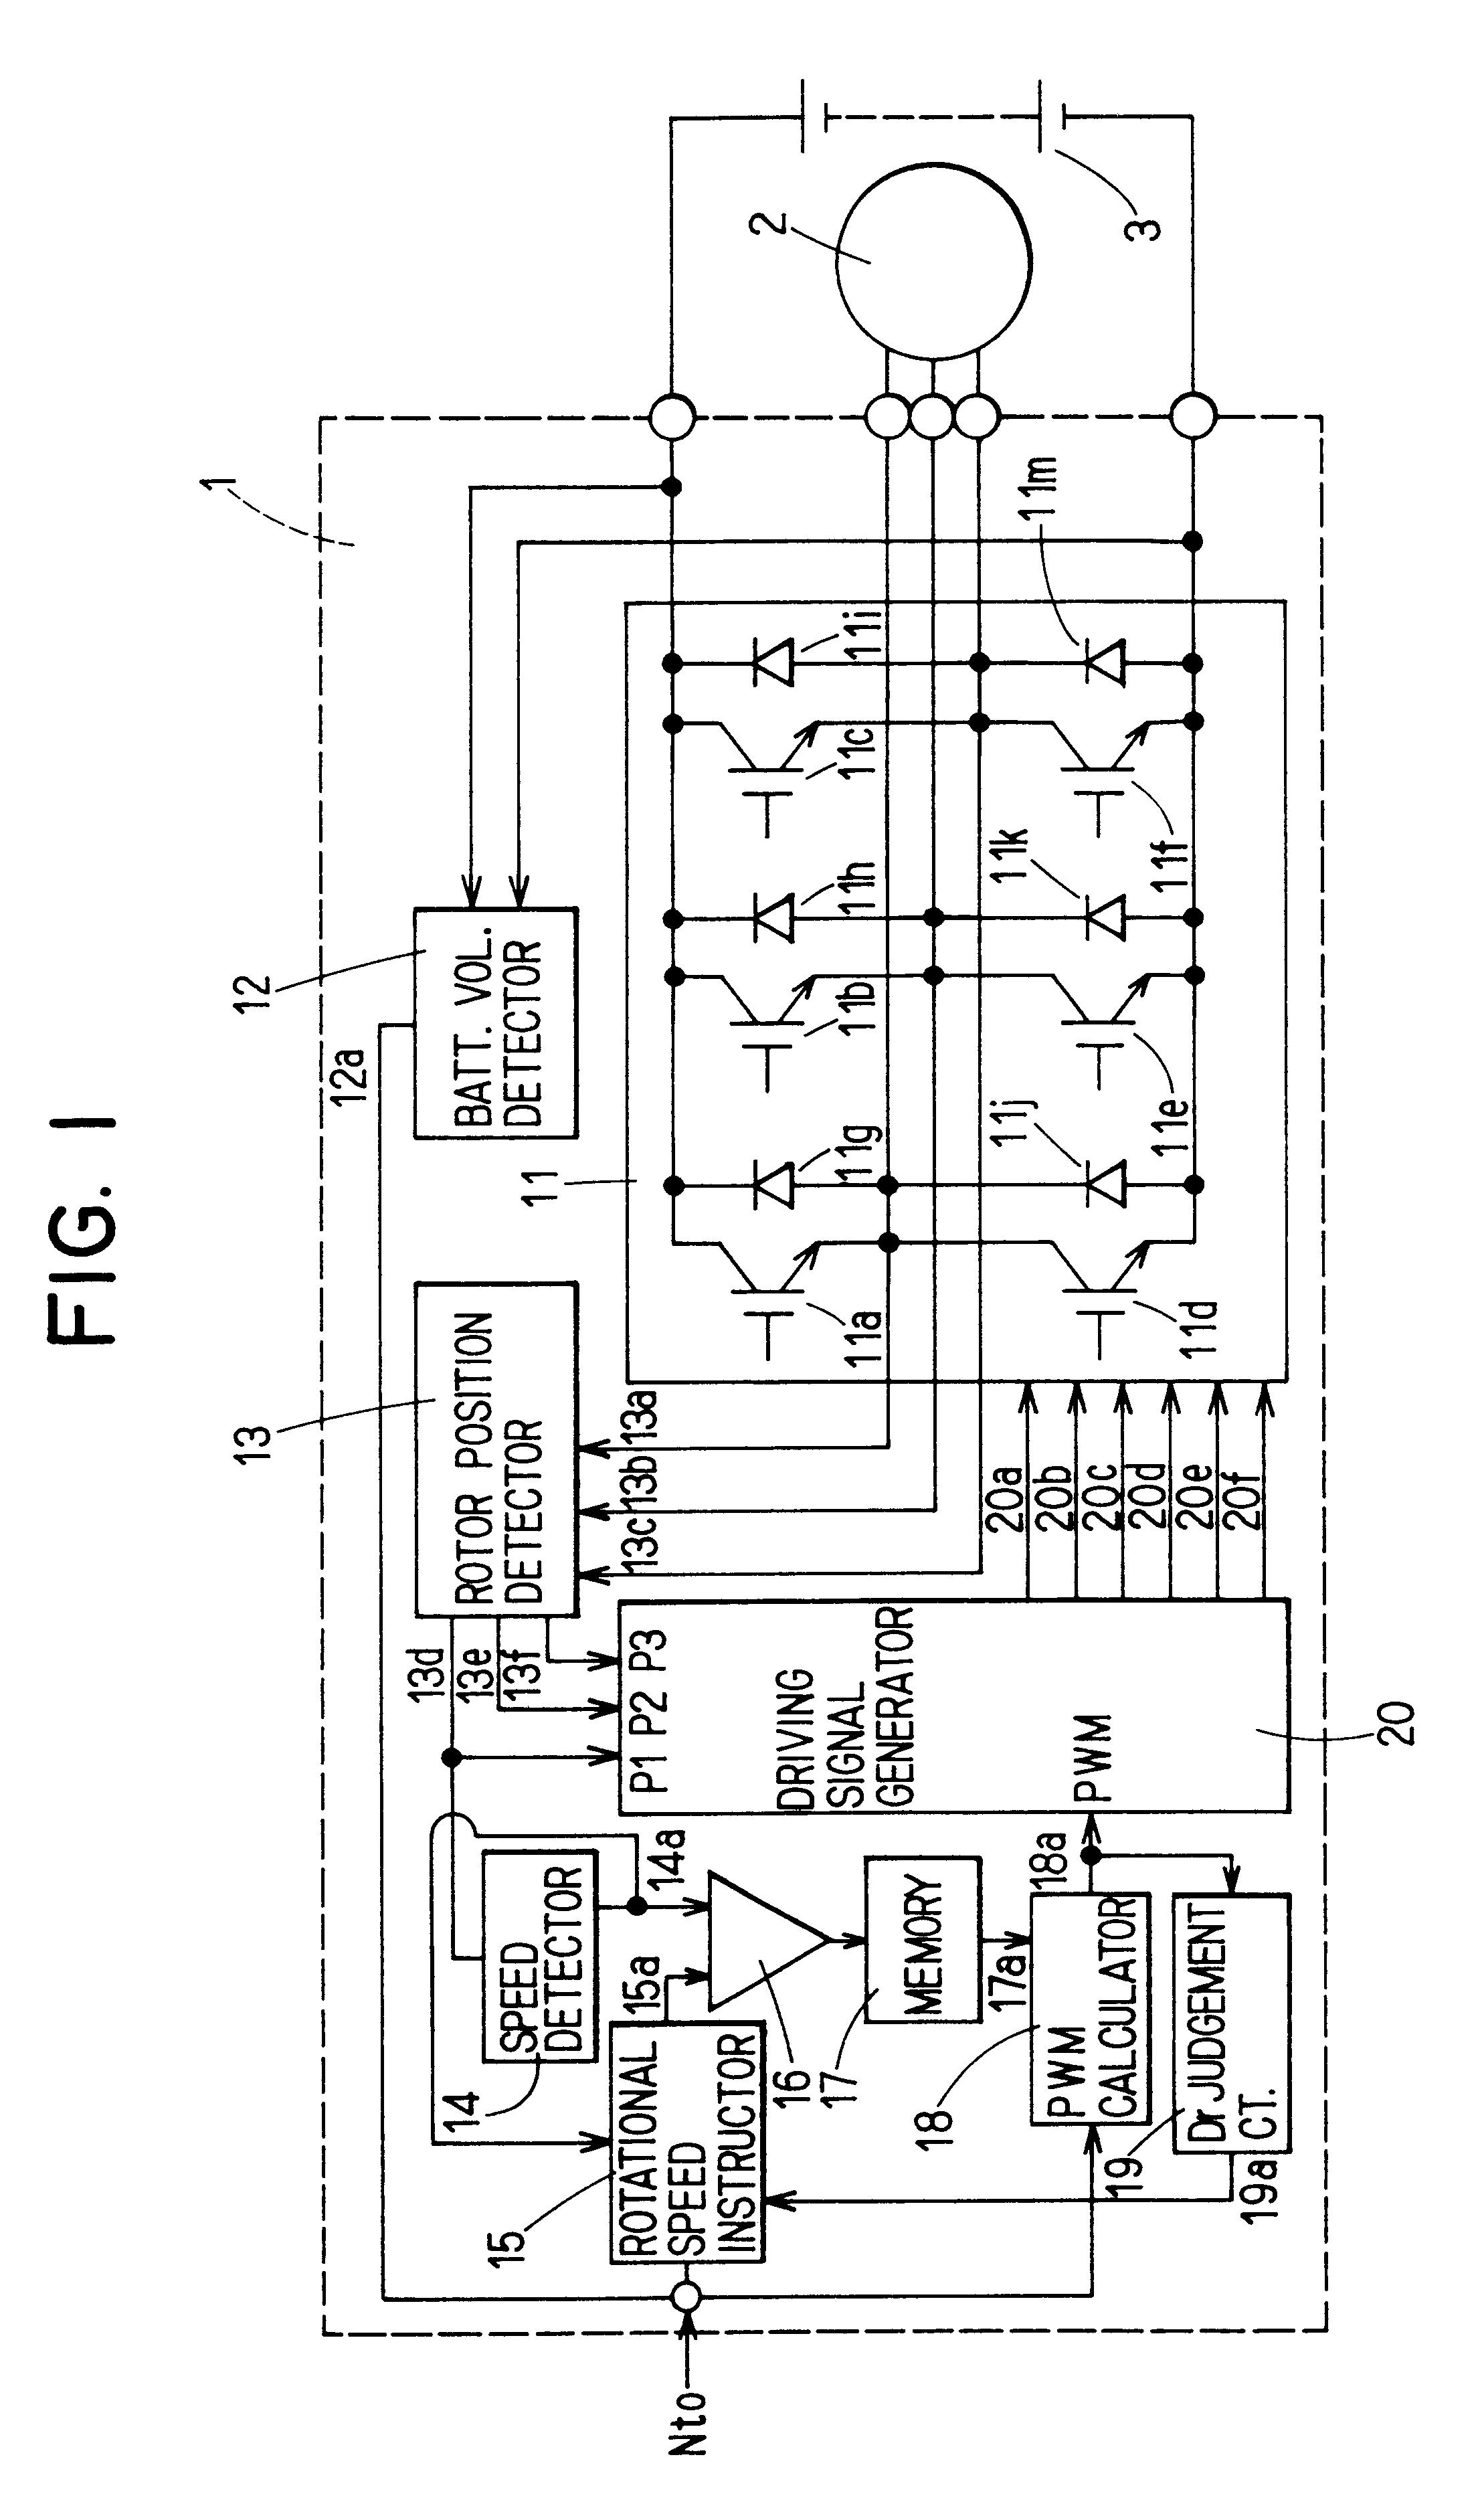 Patent Us6424798 Device For Controlling Sensorless Brushless Dc 2006 Subaru Impreza Fuse Box Drawing